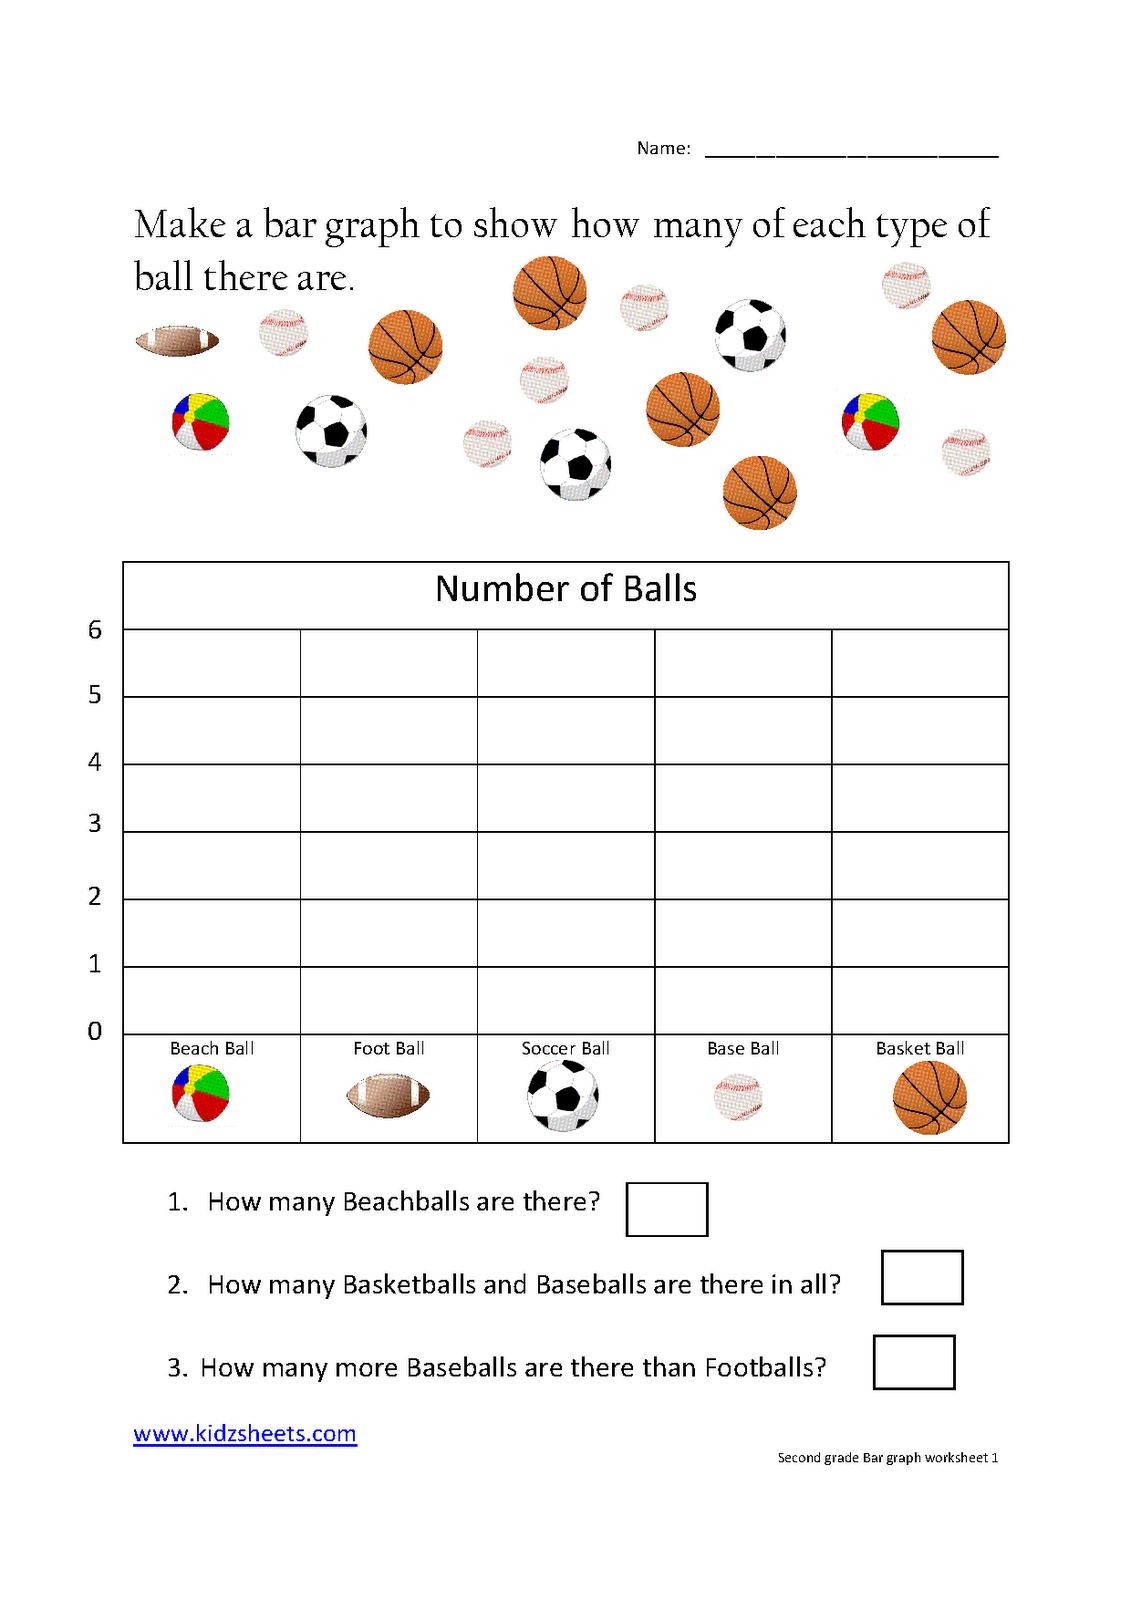 Kidz Worksheets Second Grade Bar Graph Worksheet1